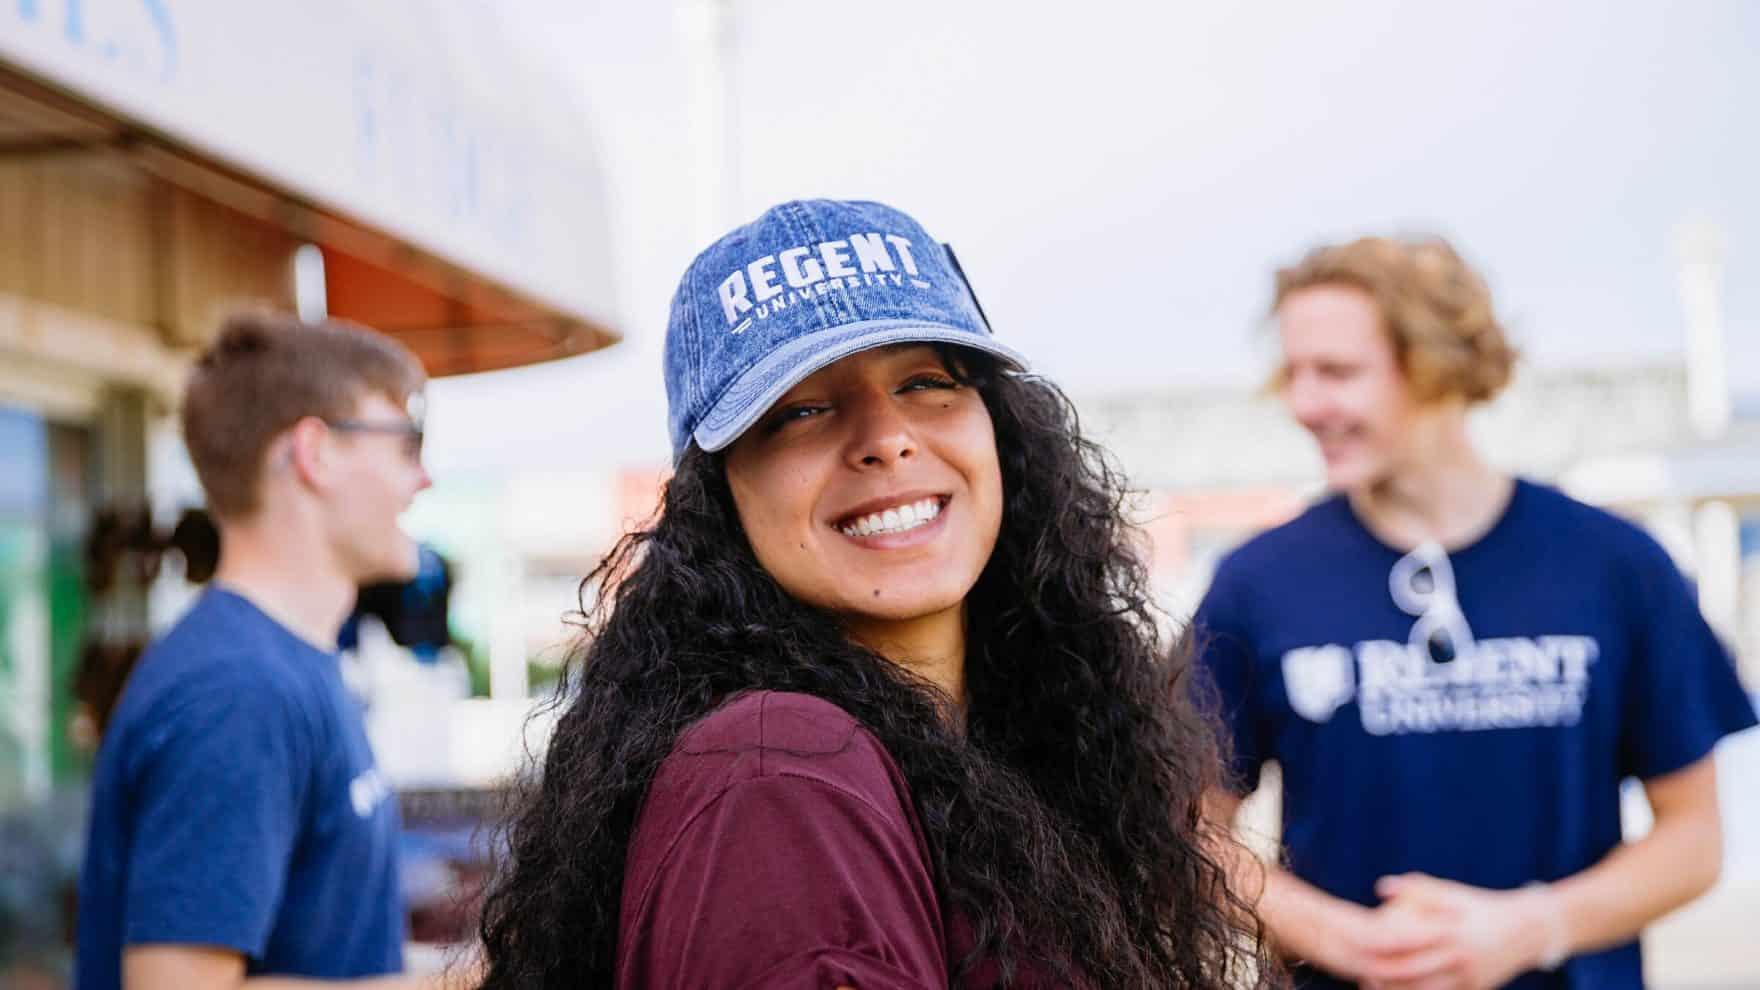 Students of Regent, a premier Christian university that offers numerous academic degree programs.